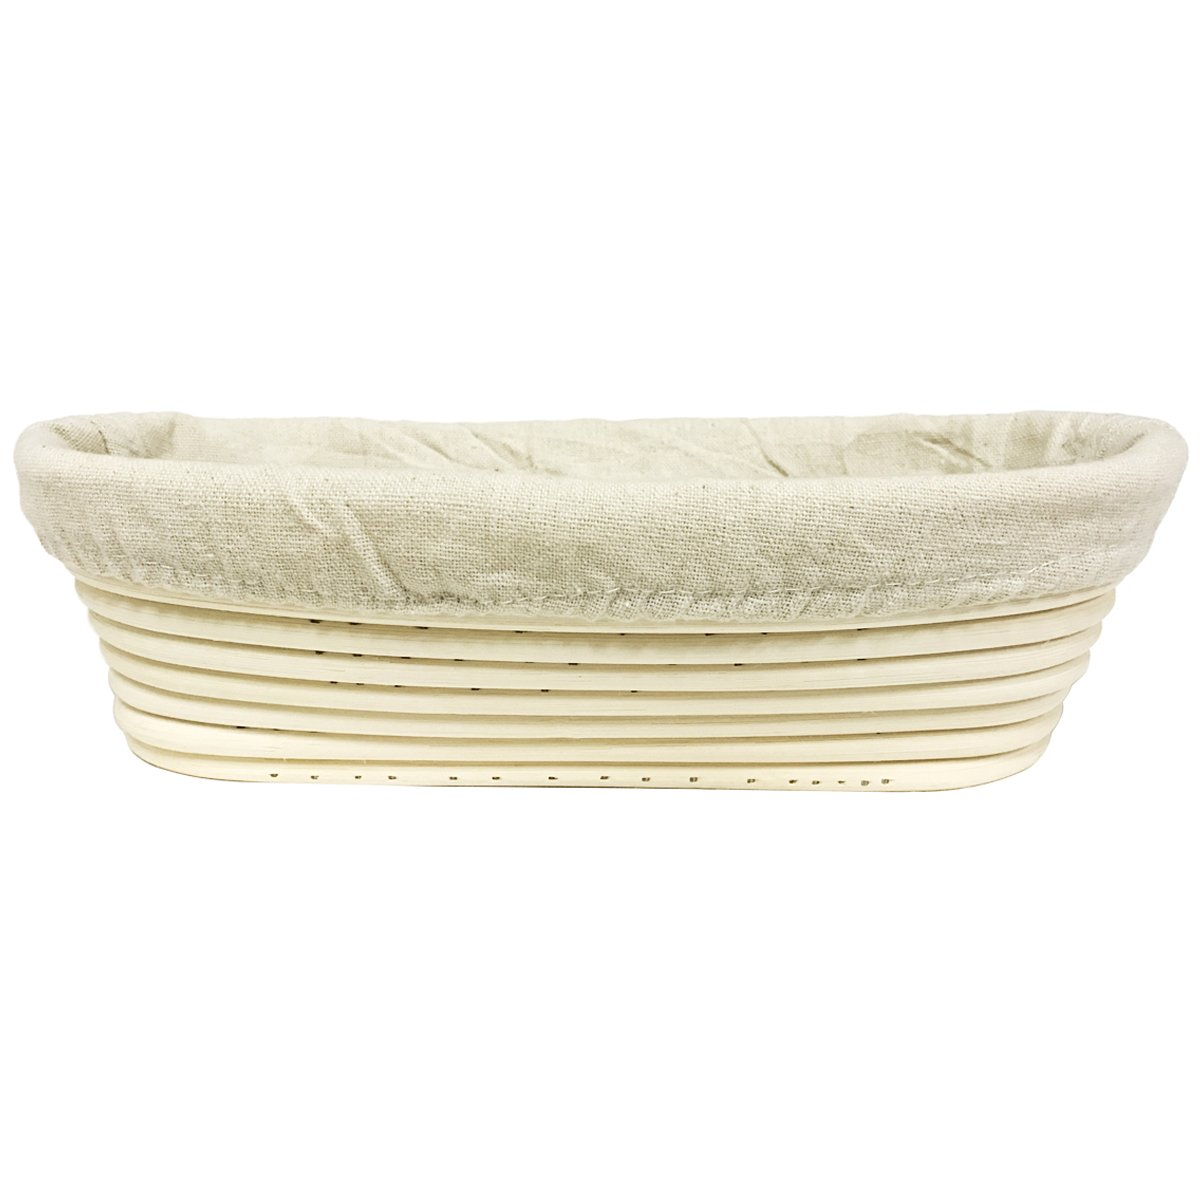 Agile-shop Oval Long Banneton Brotform Bread Dough Proofing Rising Rattan Handmade Basket & Liner (11)